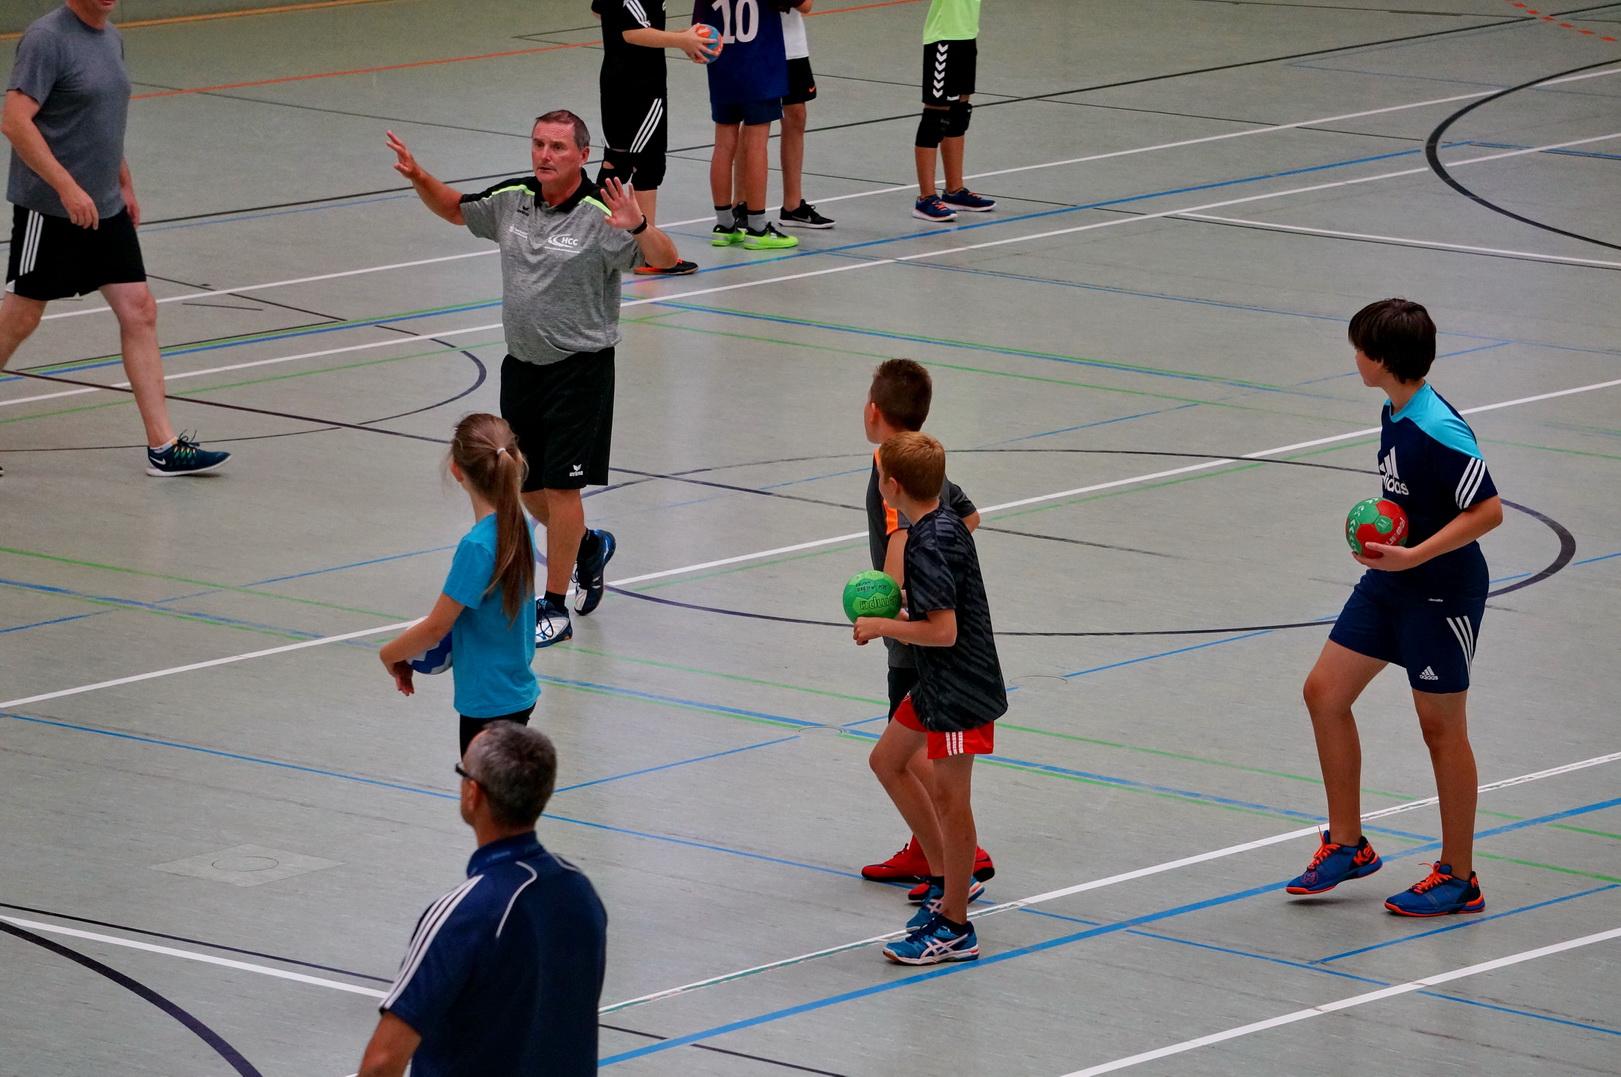 201808_Handballcamp_SDH_MG_089w